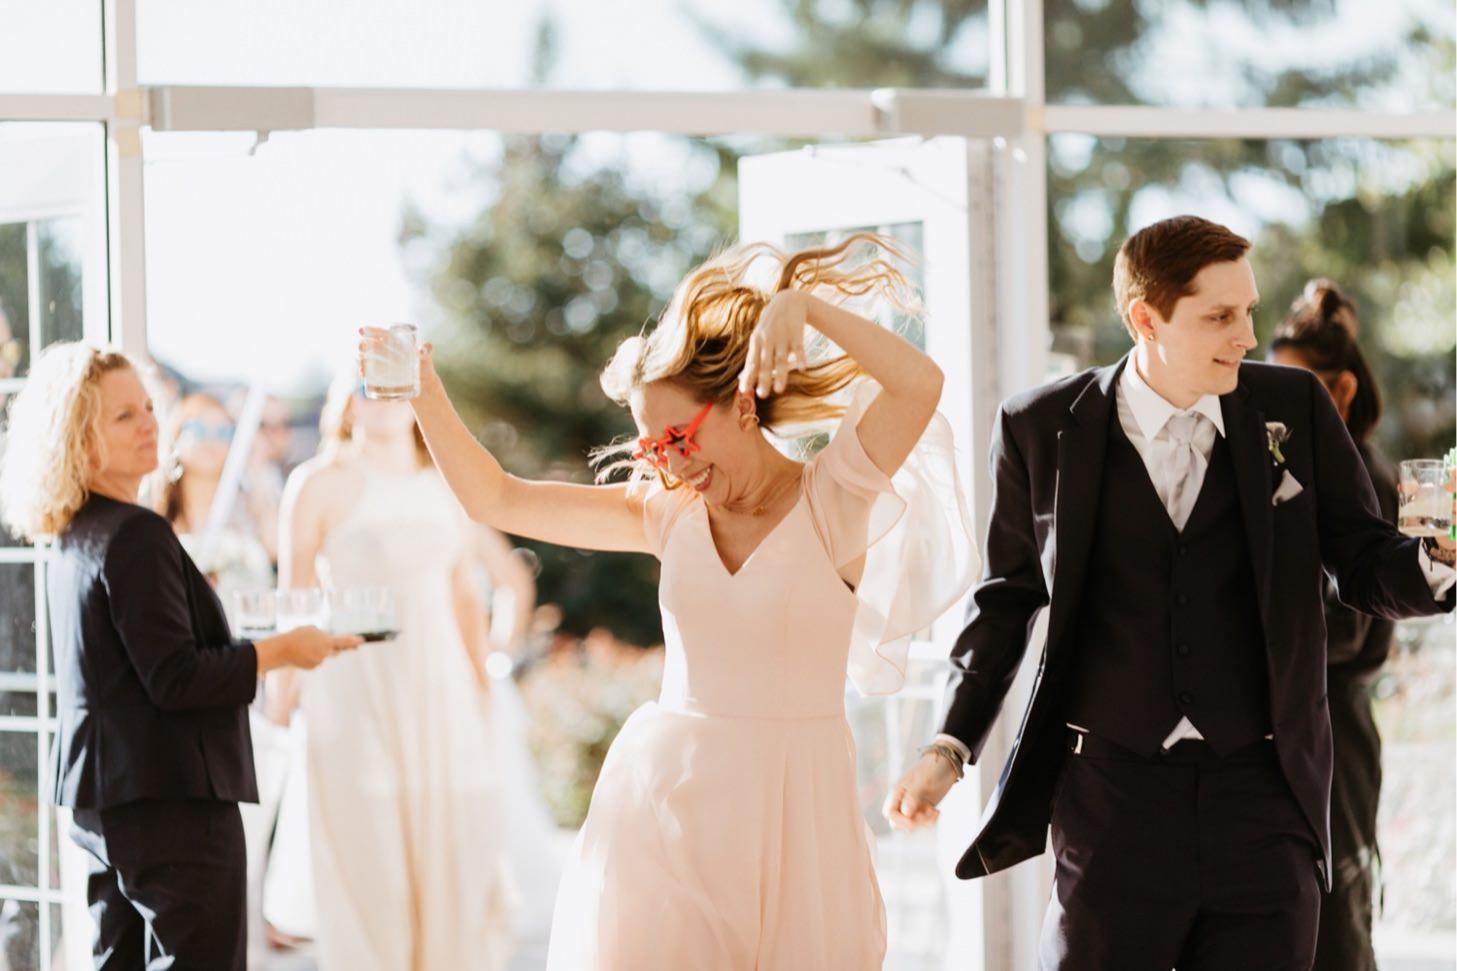 ritz-charles-wedding-reception-downtown-indianapolis-wedding-photographer023.JPG